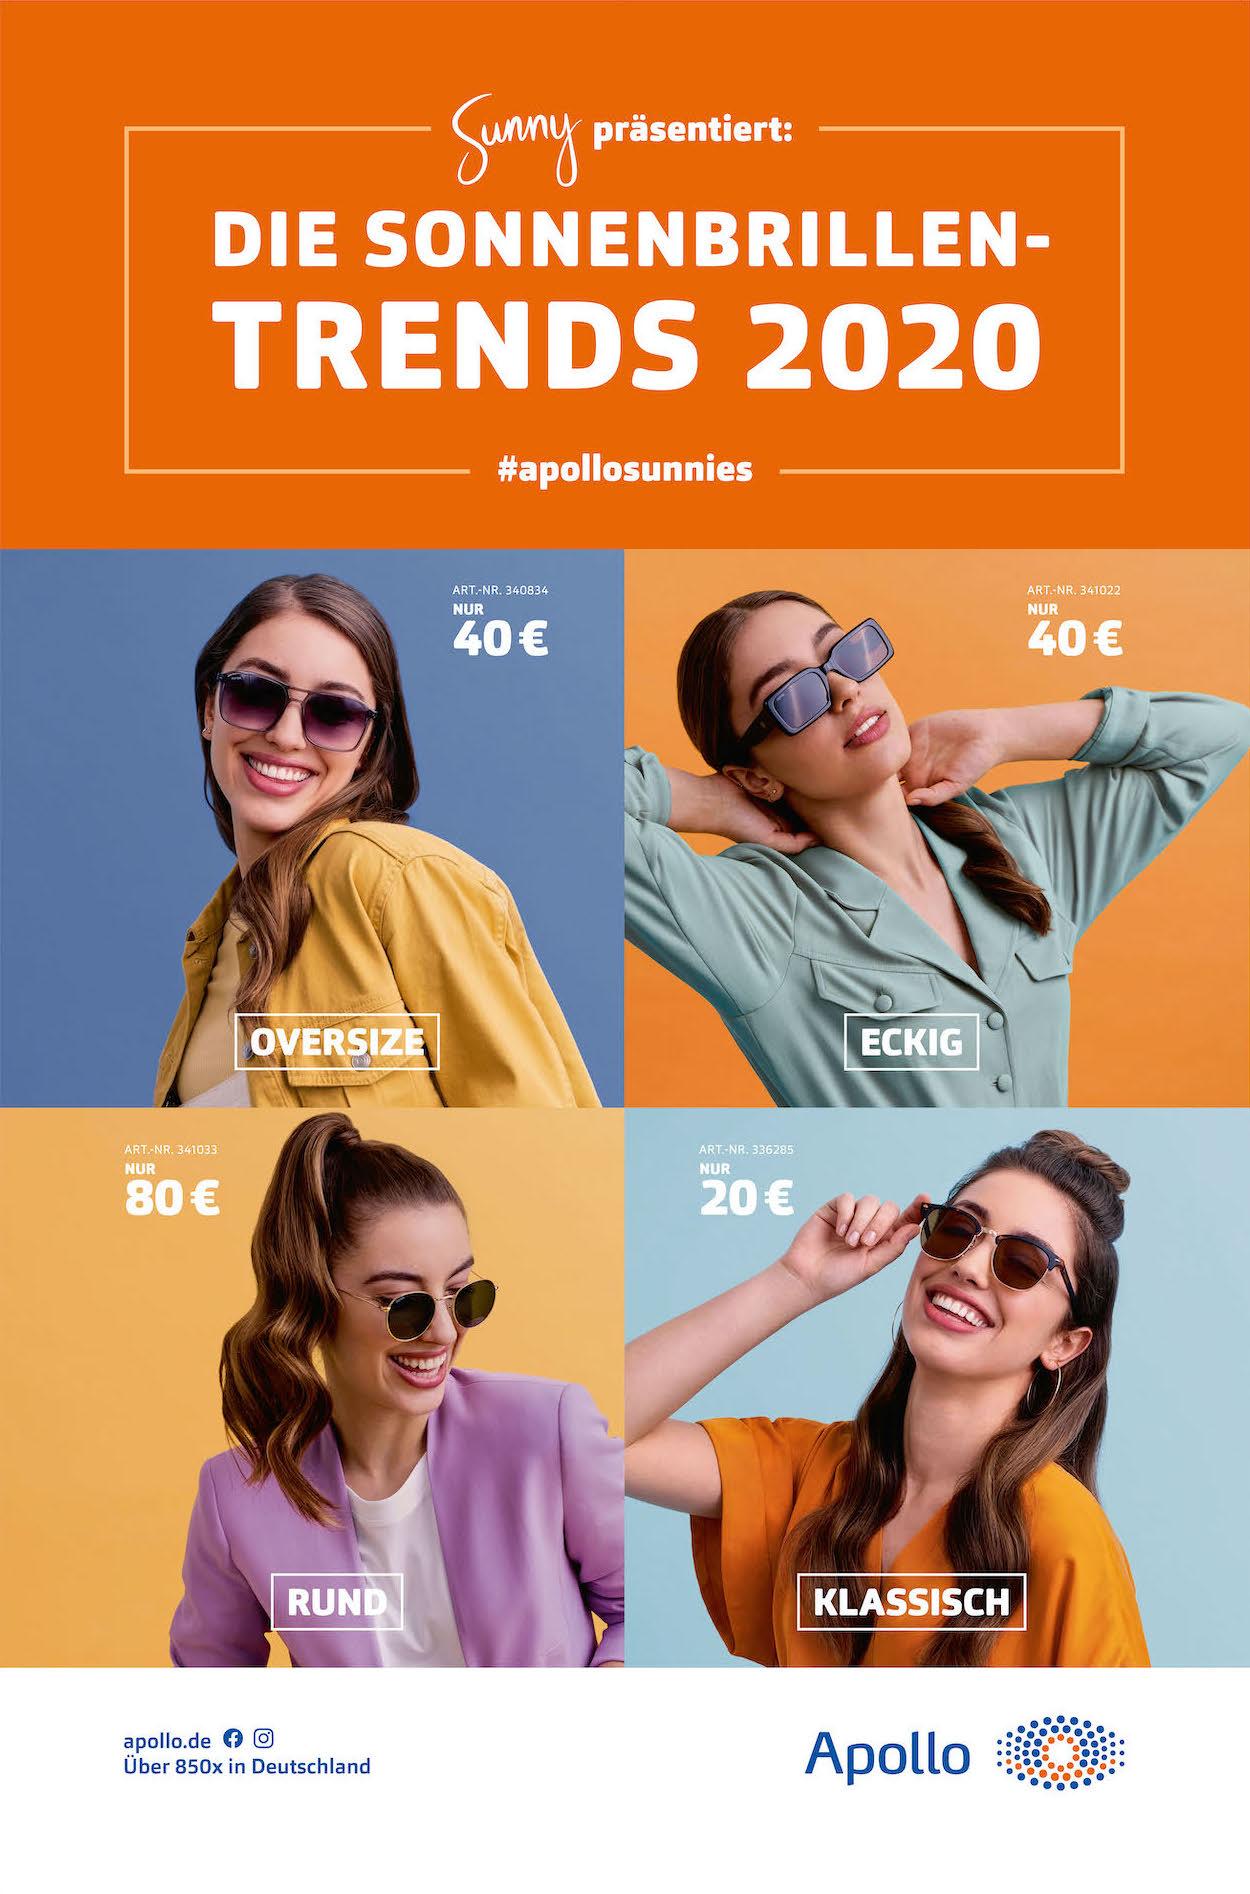 Apollo_Sonnenbrillen_Trends_Greta_Horsch